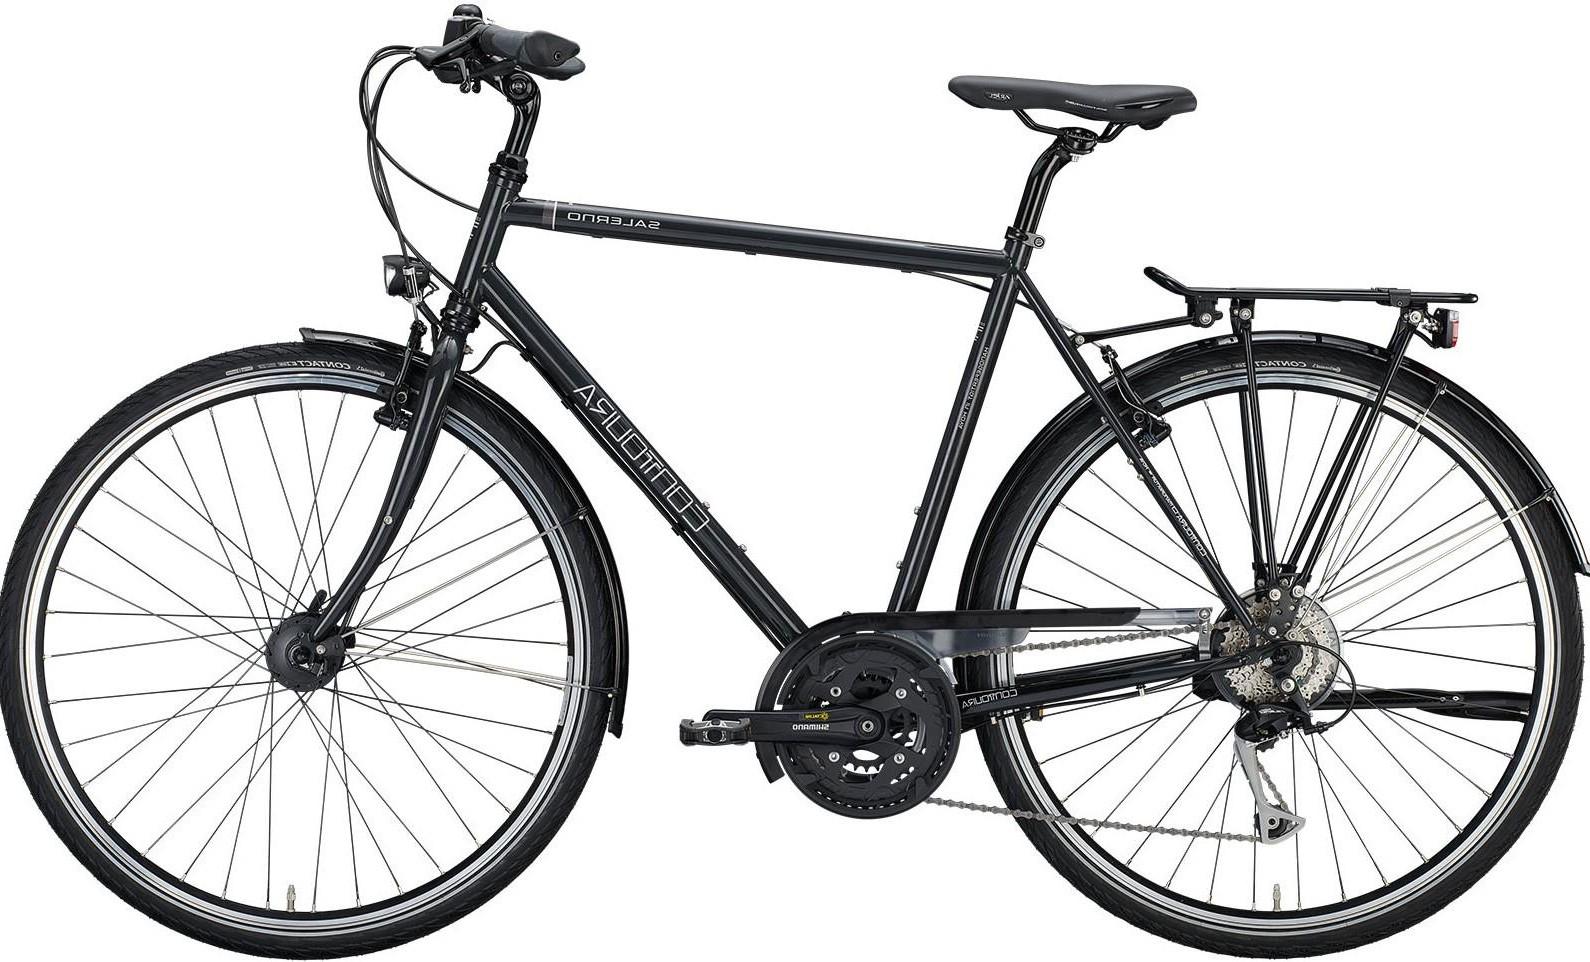 CONTOURA Salerno Bicycle